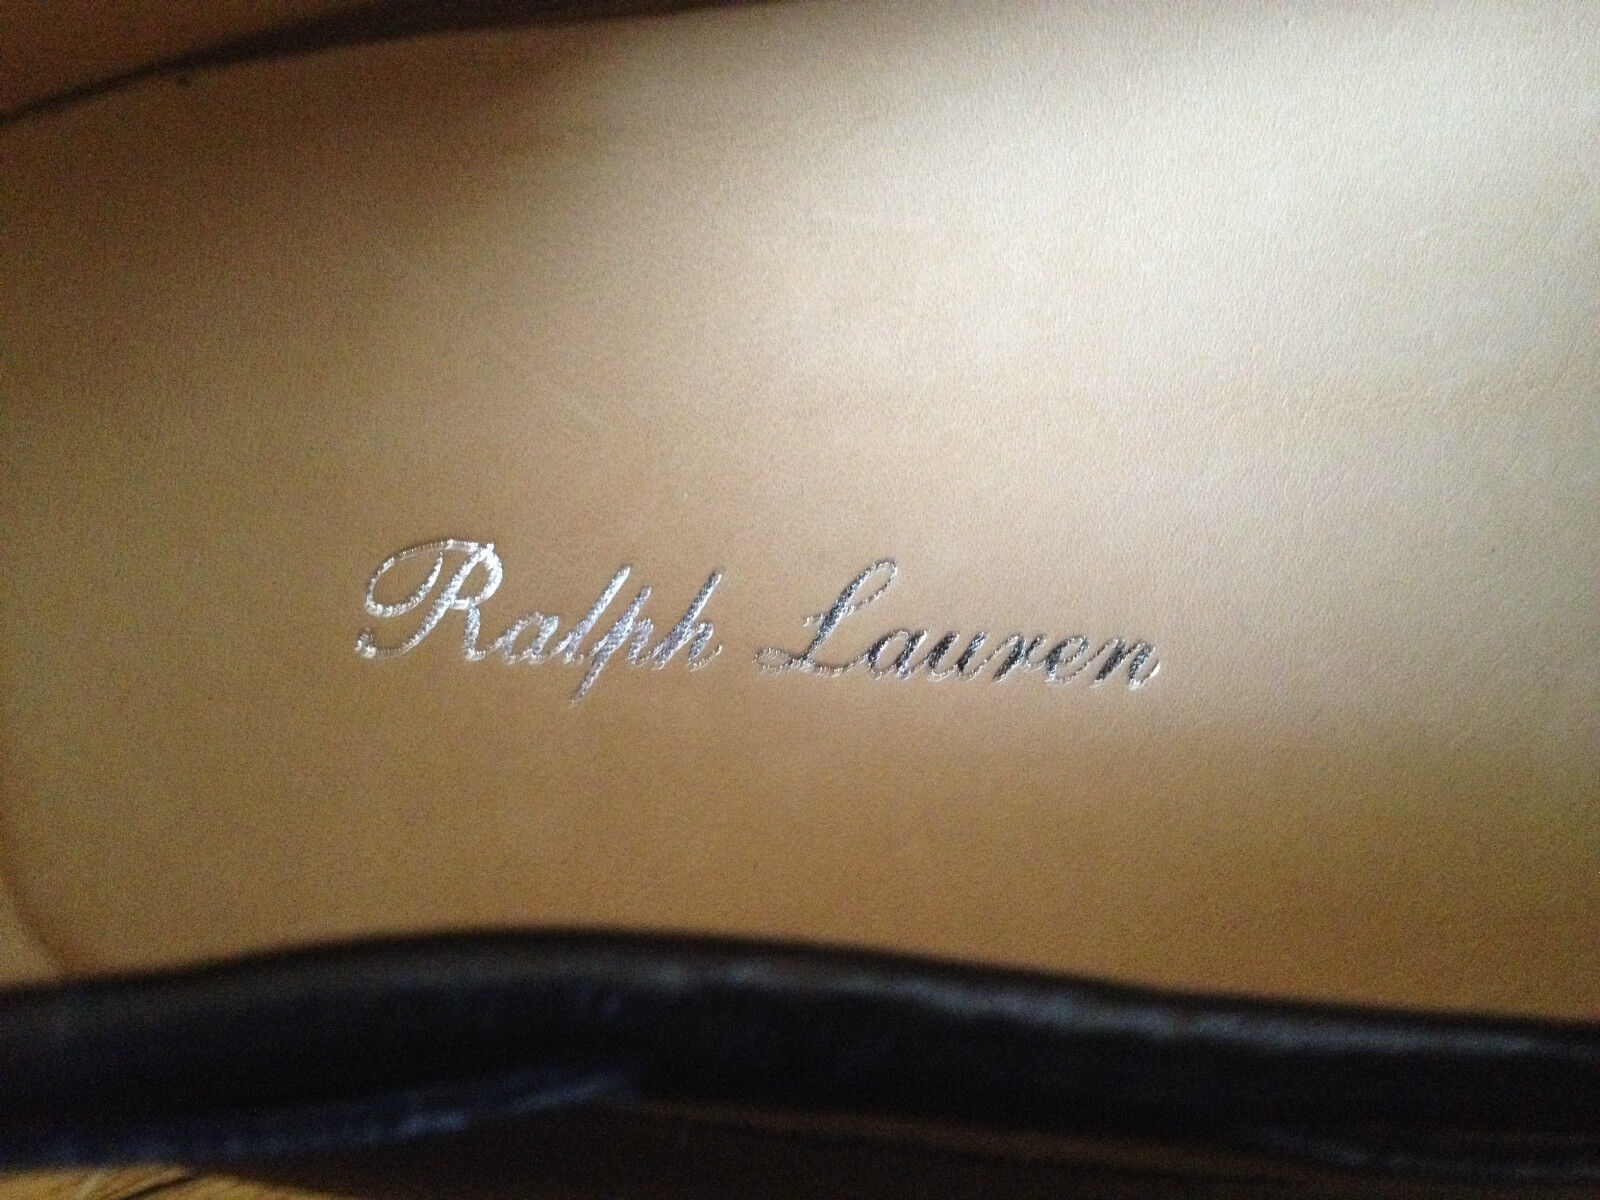 RALPH LAUREN PURPLE LABEL MOKASSINS SCHWARZ BUSINESS LEDER SCHWARZ MOKASSINS  US11.5 EUR 45 UK10.5 6b69f9